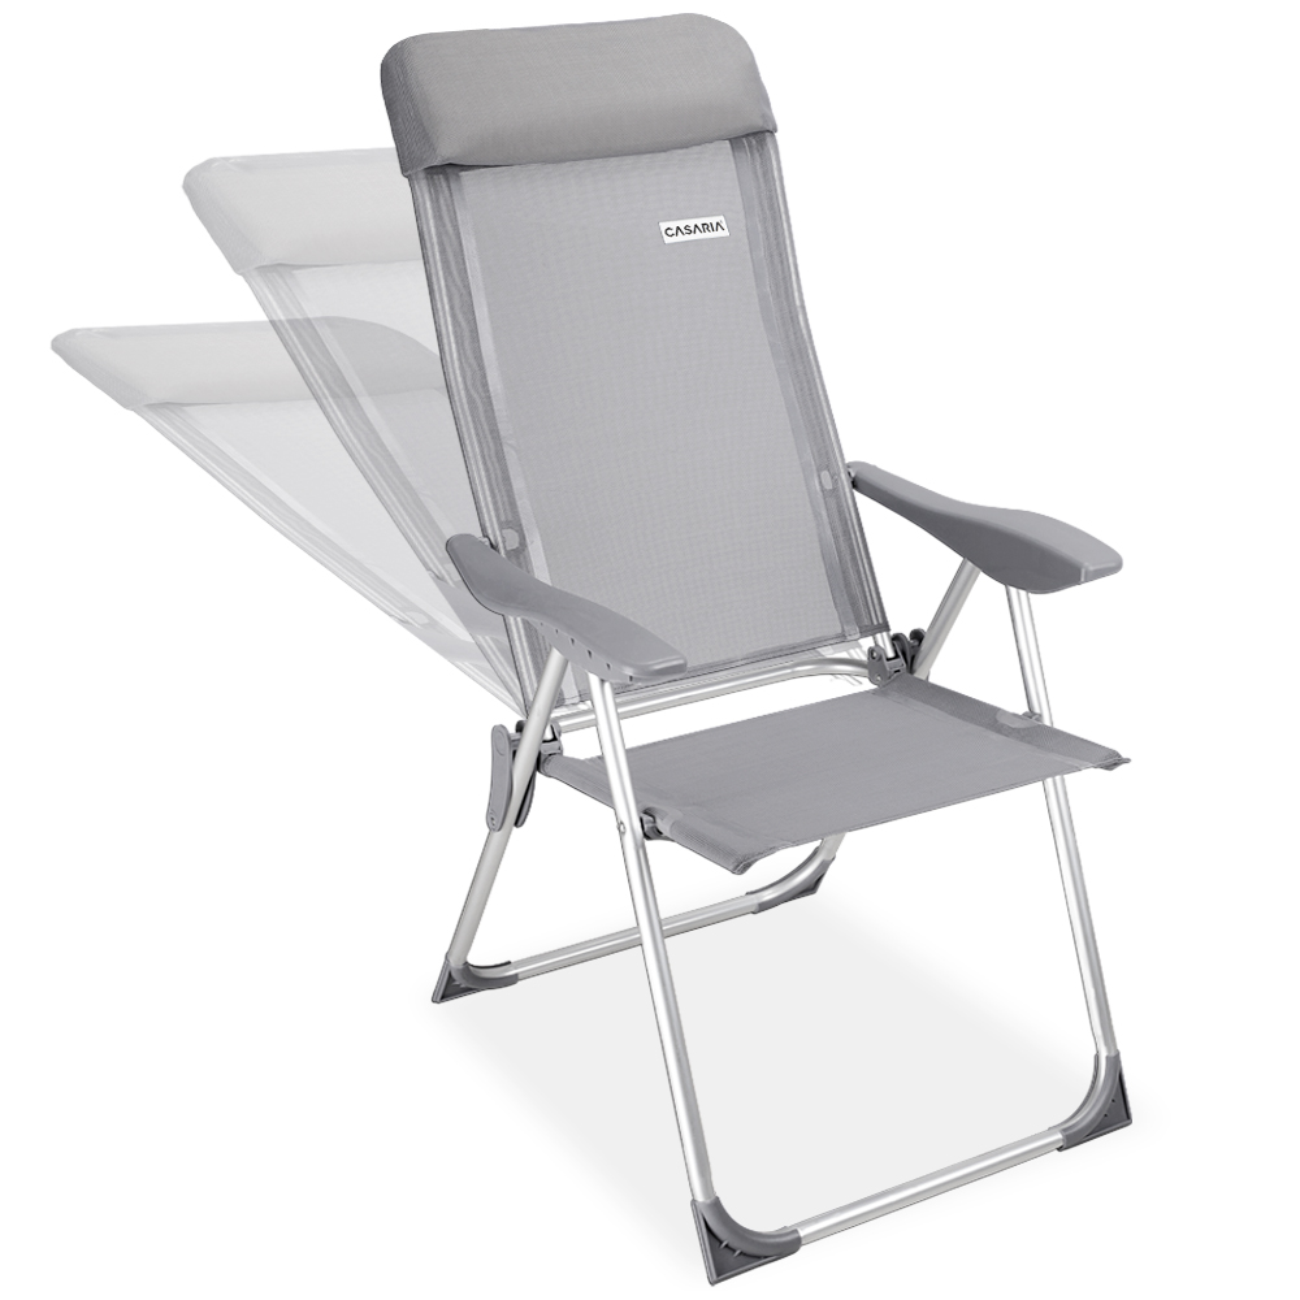 4er set alu gartenstuhl hochlehner klappstuhl campingstuhl stuhl aluminium grau ebay. Black Bedroom Furniture Sets. Home Design Ideas